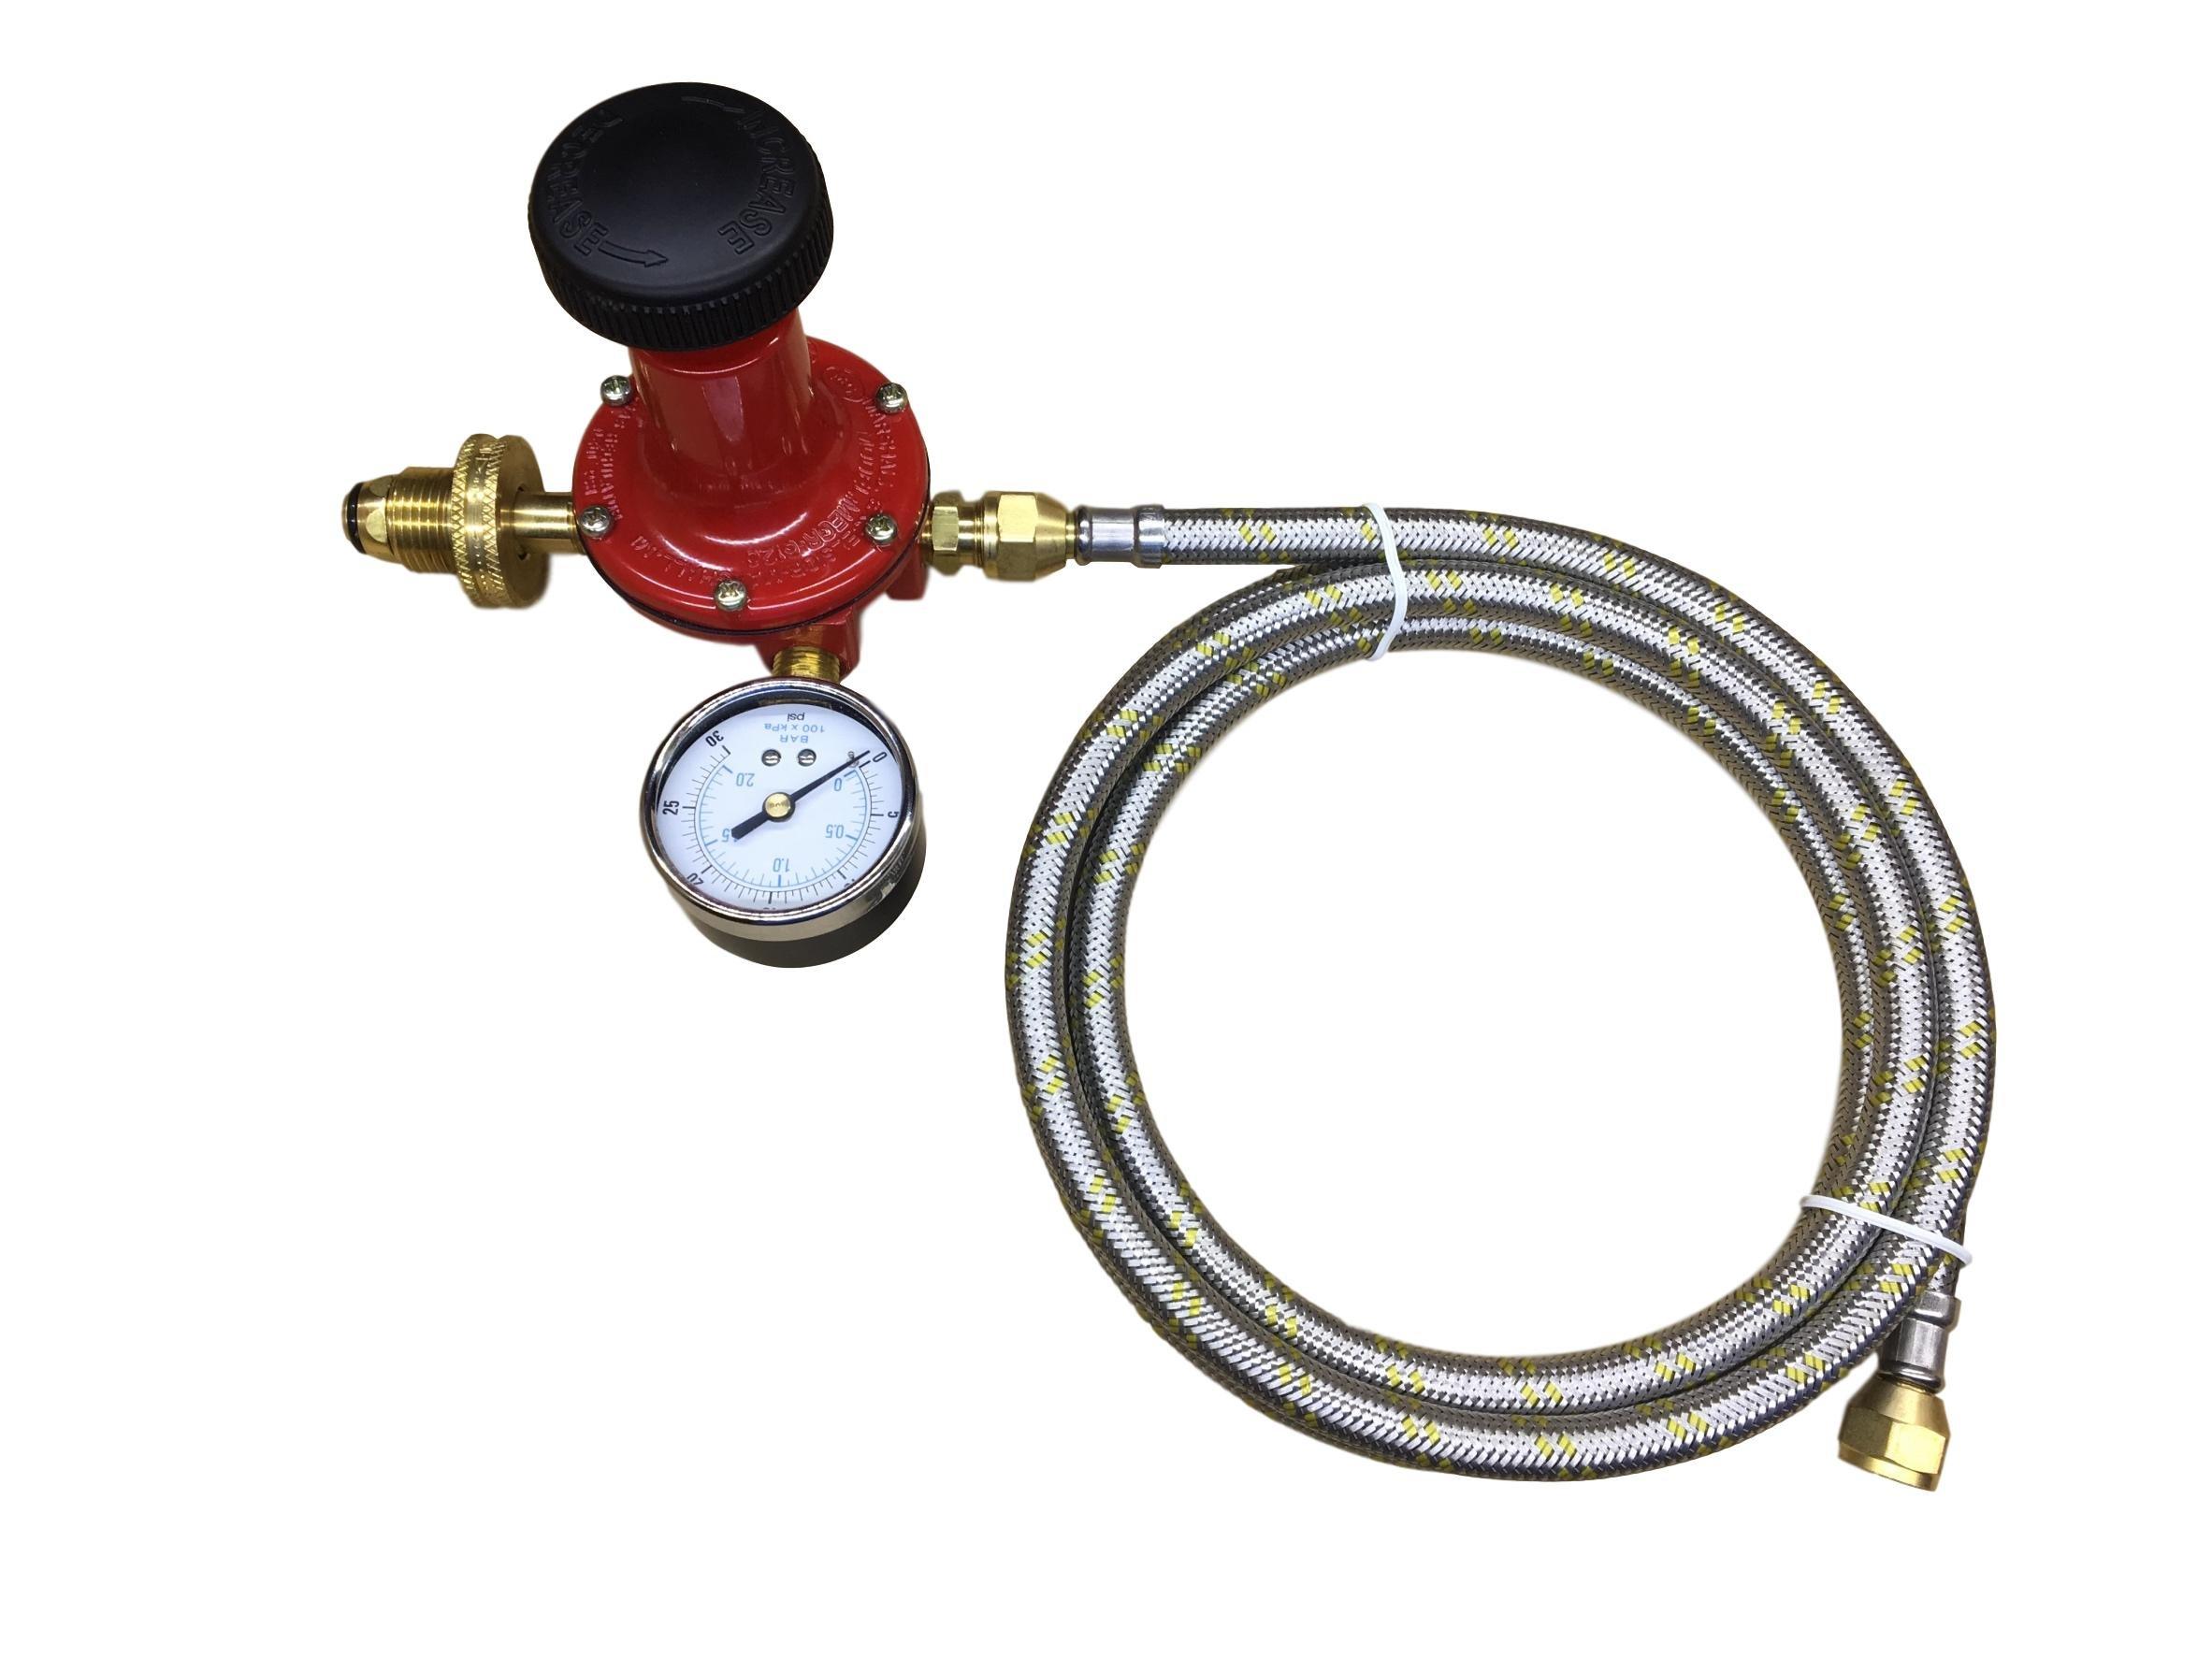 Propane LP Gas Adjustable 0-30psi High Pressure Regulator Soft Nose POL Brass Wheel Connector, Gauge and 6ft Stainless Steel Braided Hose